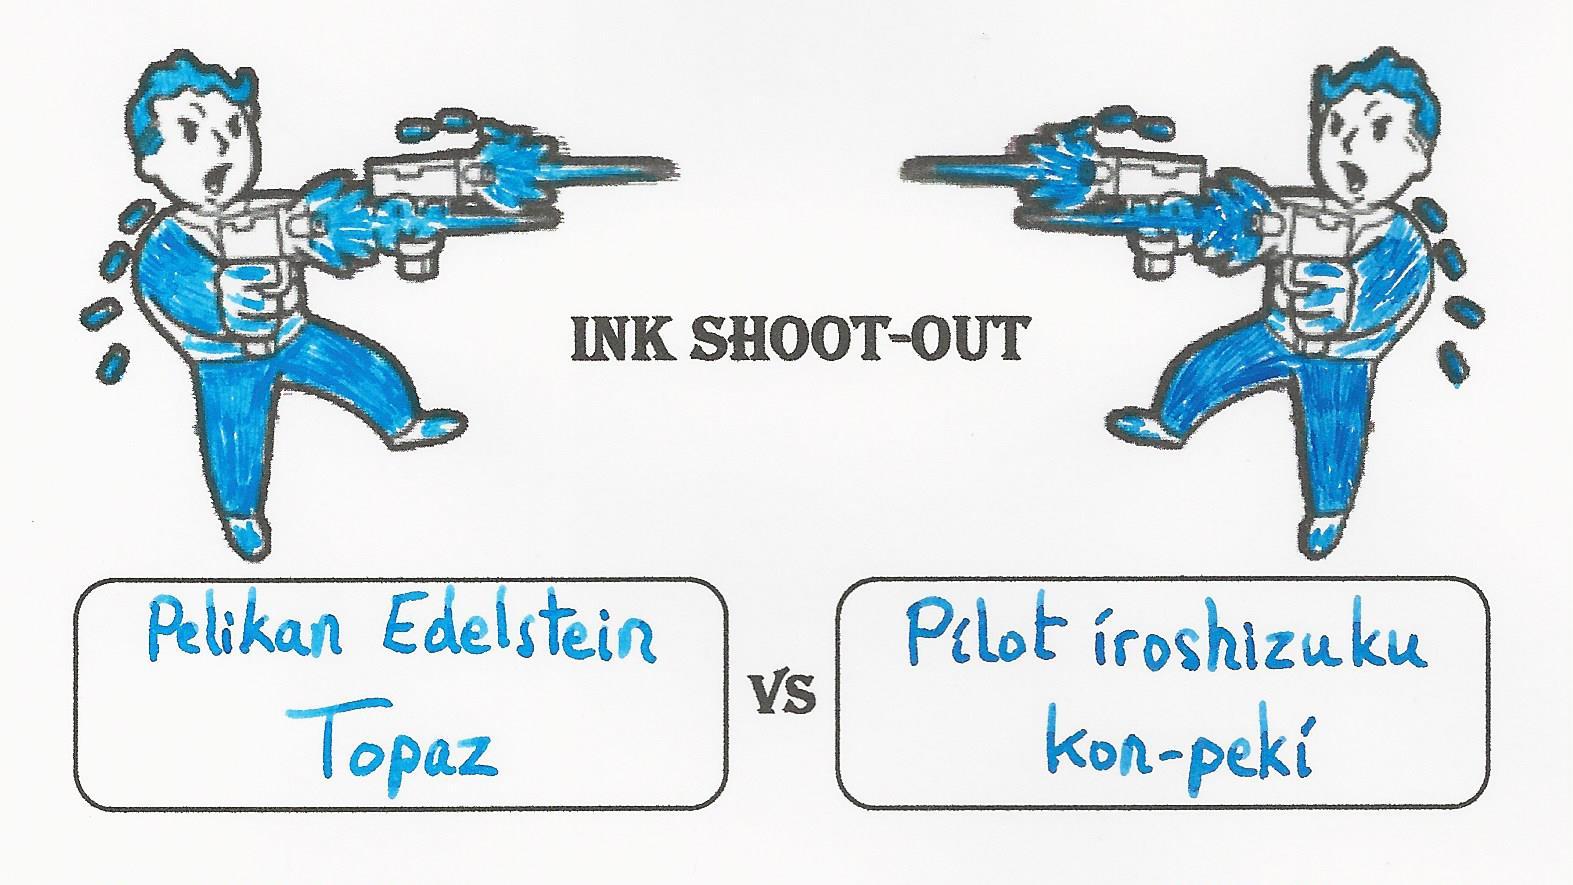 fpn_1463928156__topaz_vs_kon-peki_shoot-